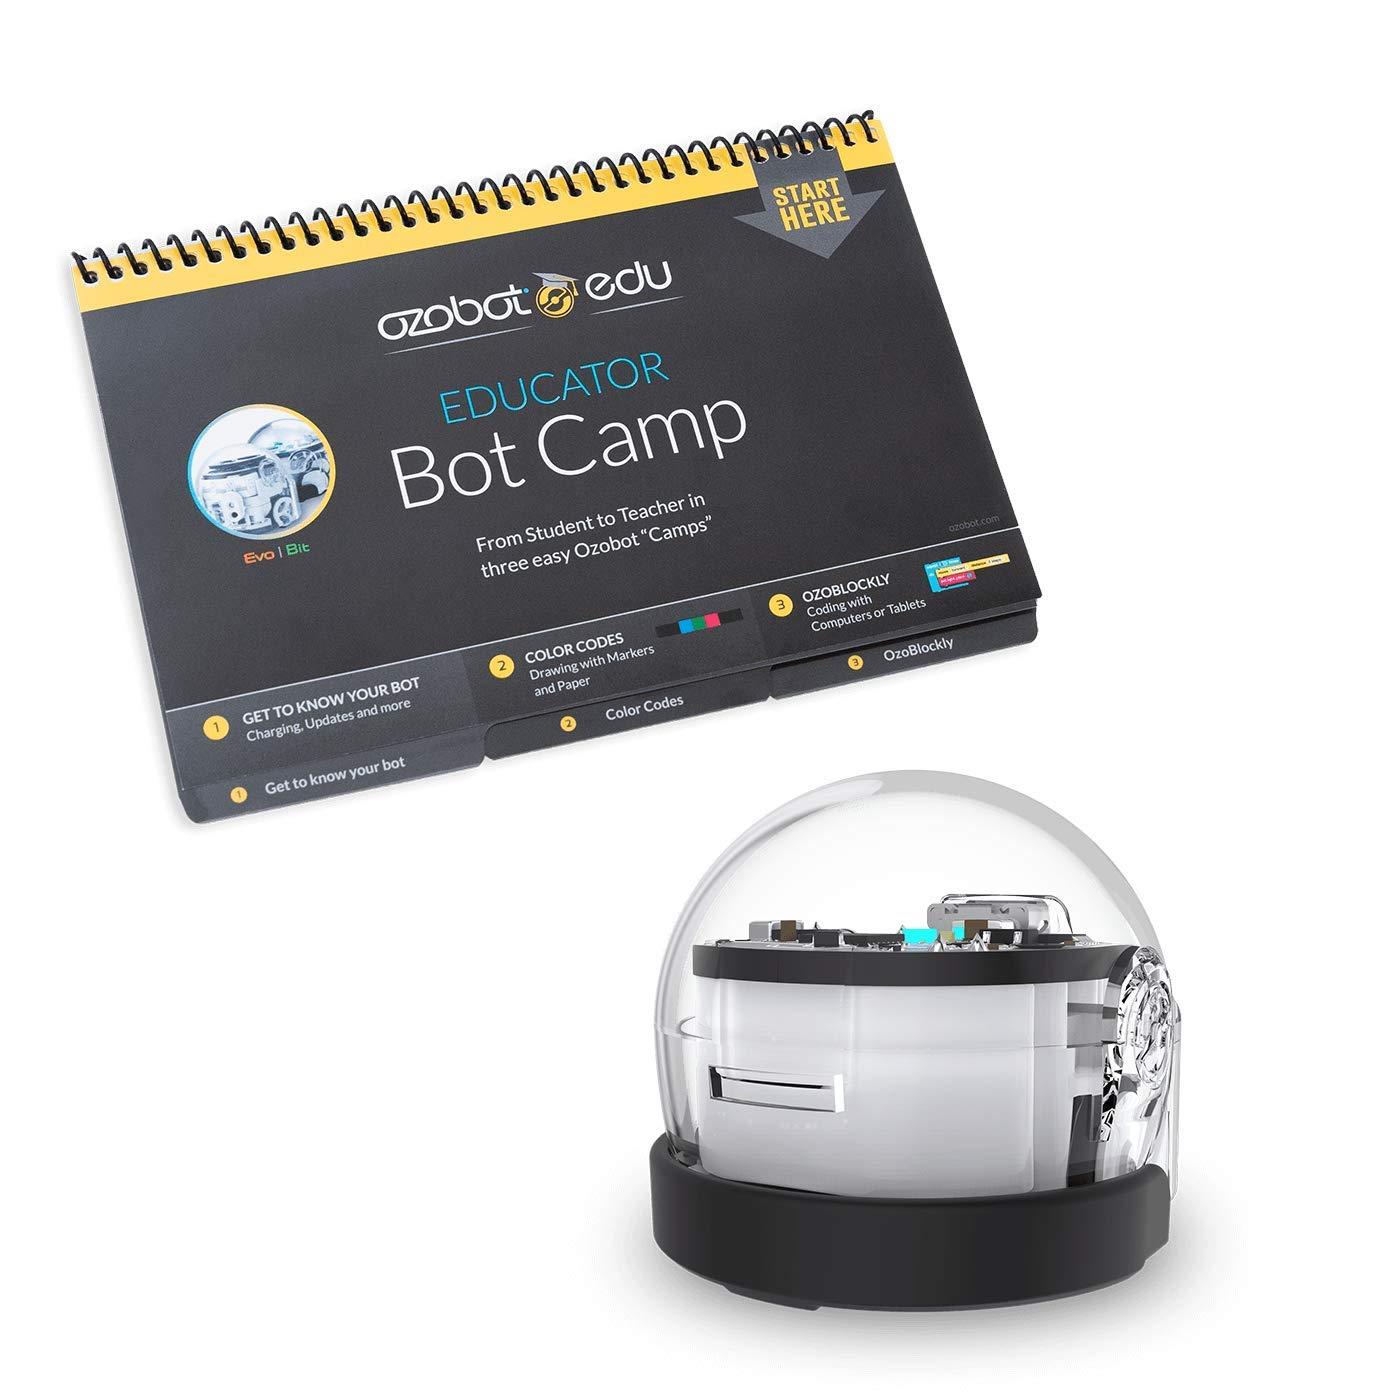 Ozobot Bit Educator Entry Kit - Non-Connected Coding Robot & Teacher Training in 2 Ways to Code - STEM & STEAM for Grades K-12 (White)